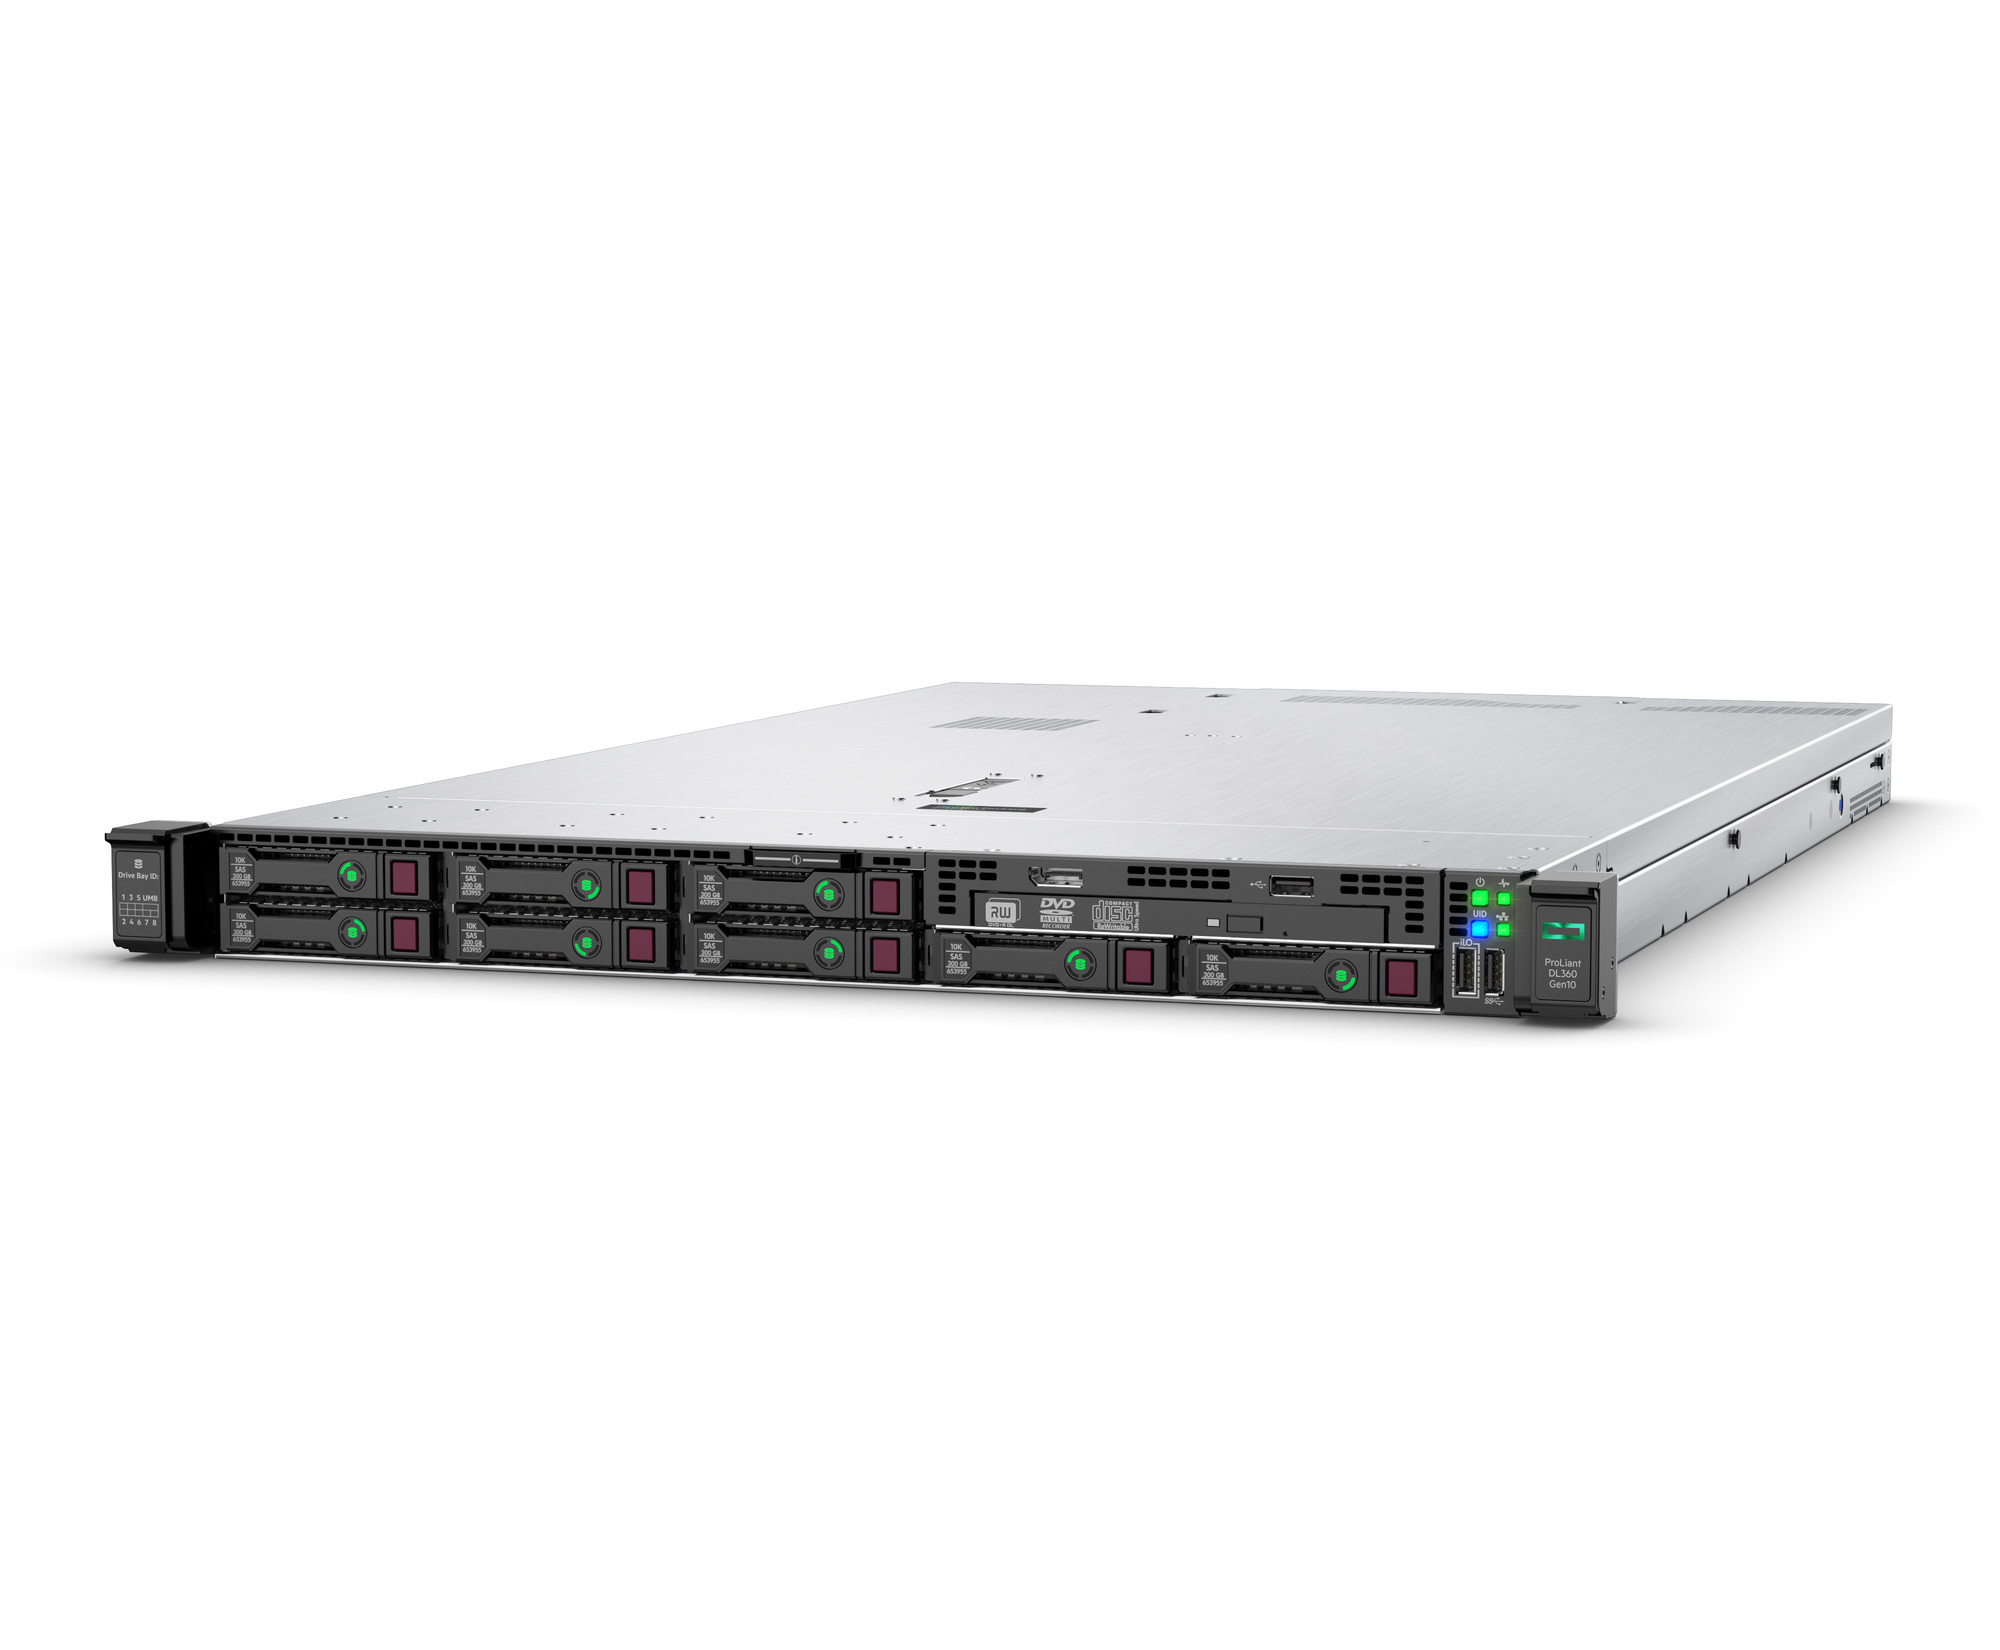 HPE ProLiant DL360, HPE